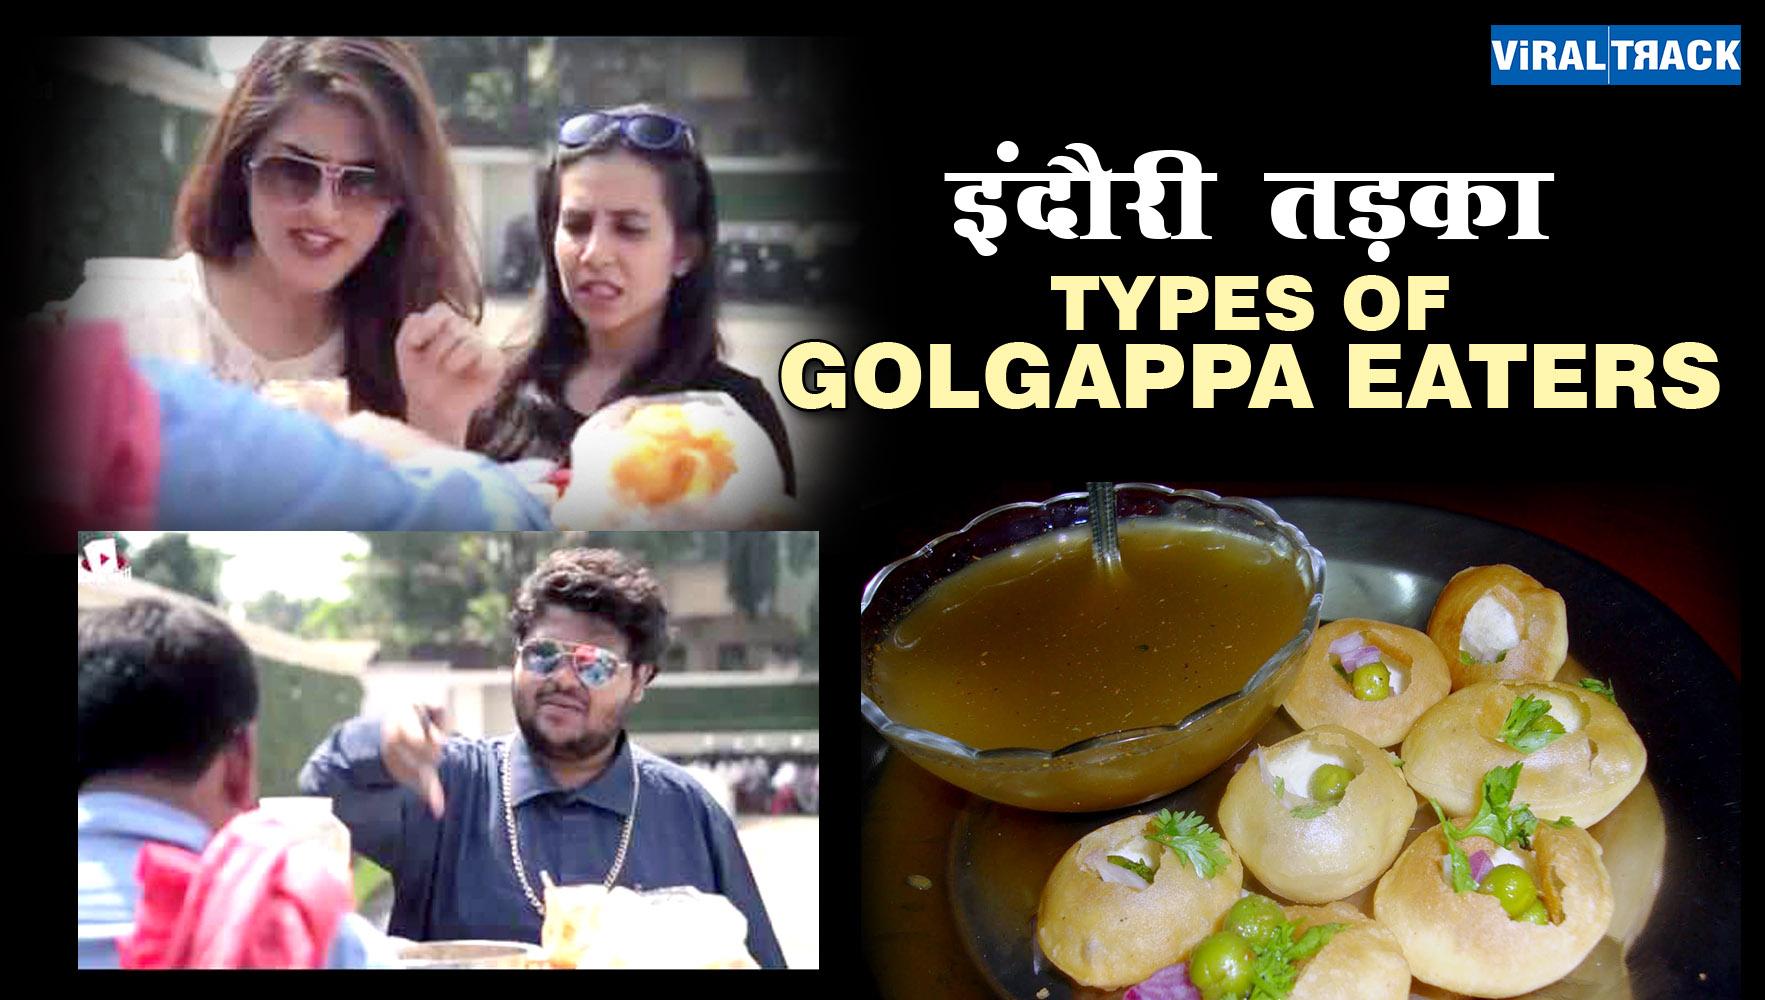 Types Of Golgappa Eaters Very Funny Desi Videos